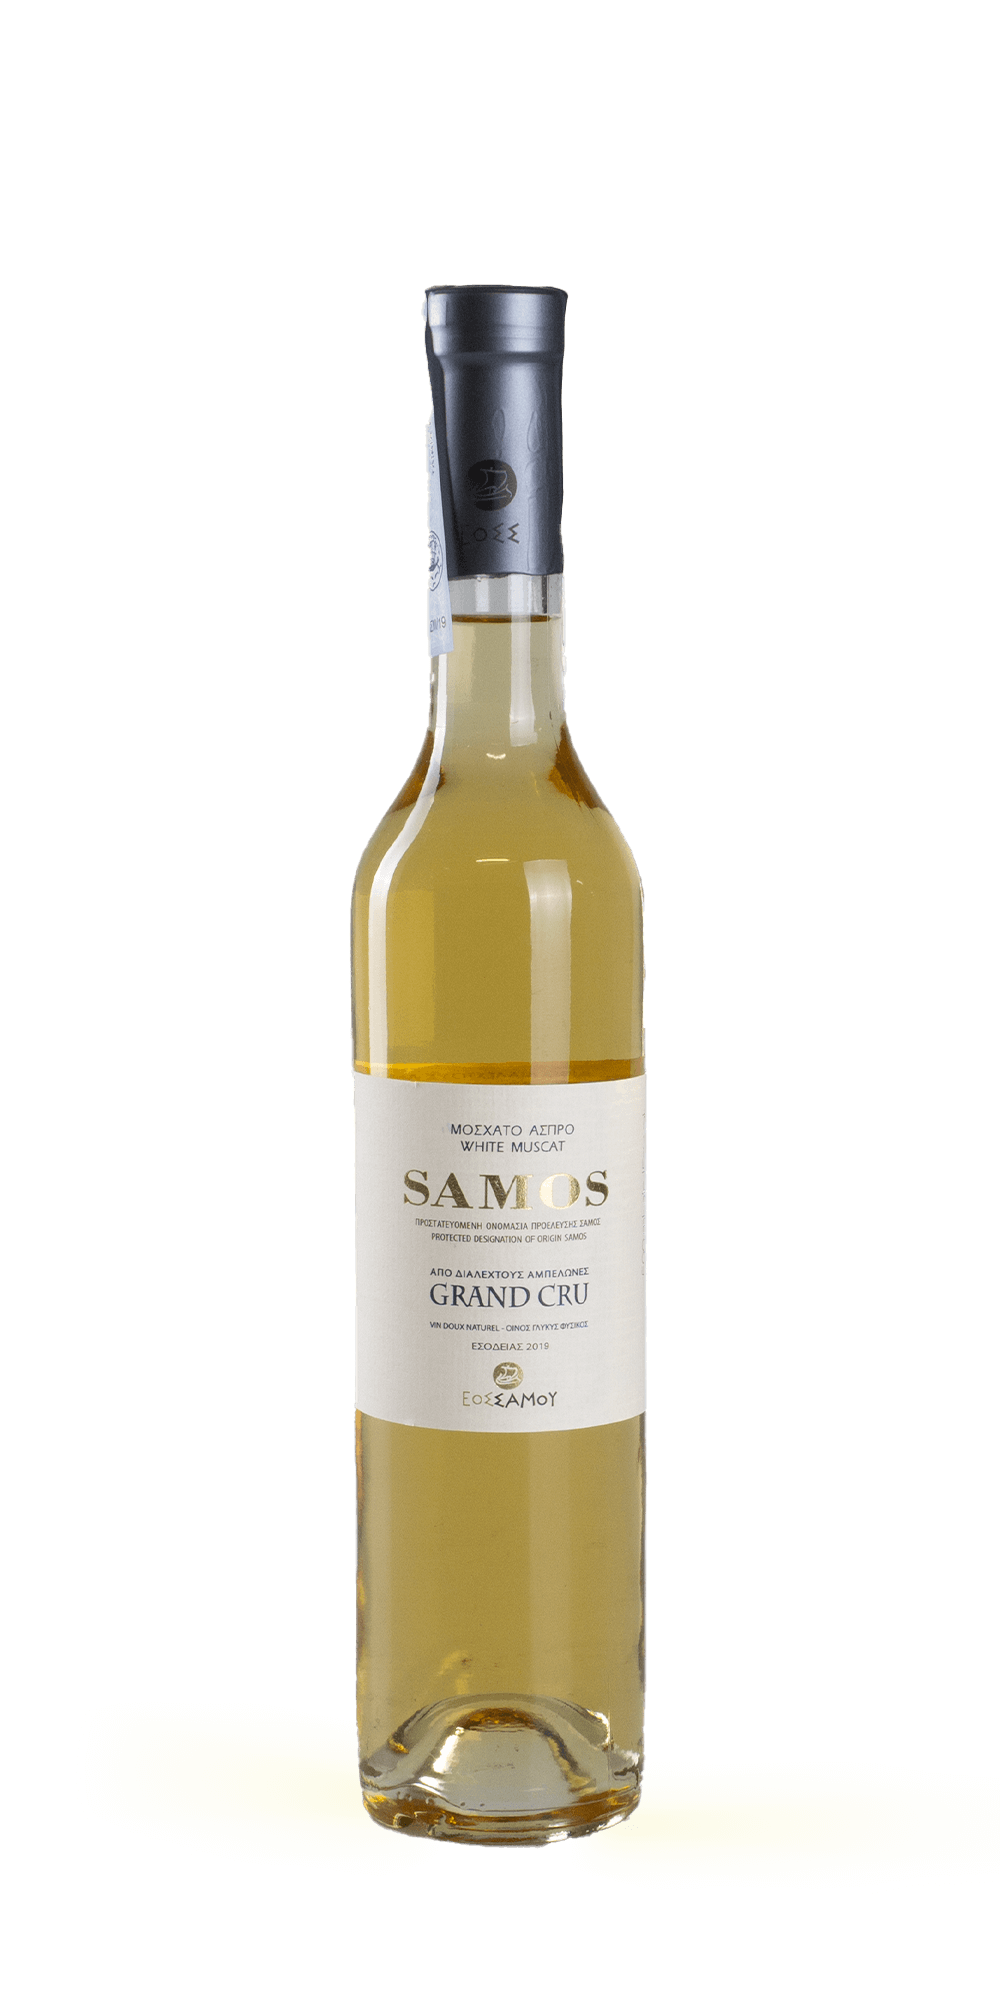 Samos Grand Cru Vin Doux Naturel 2019